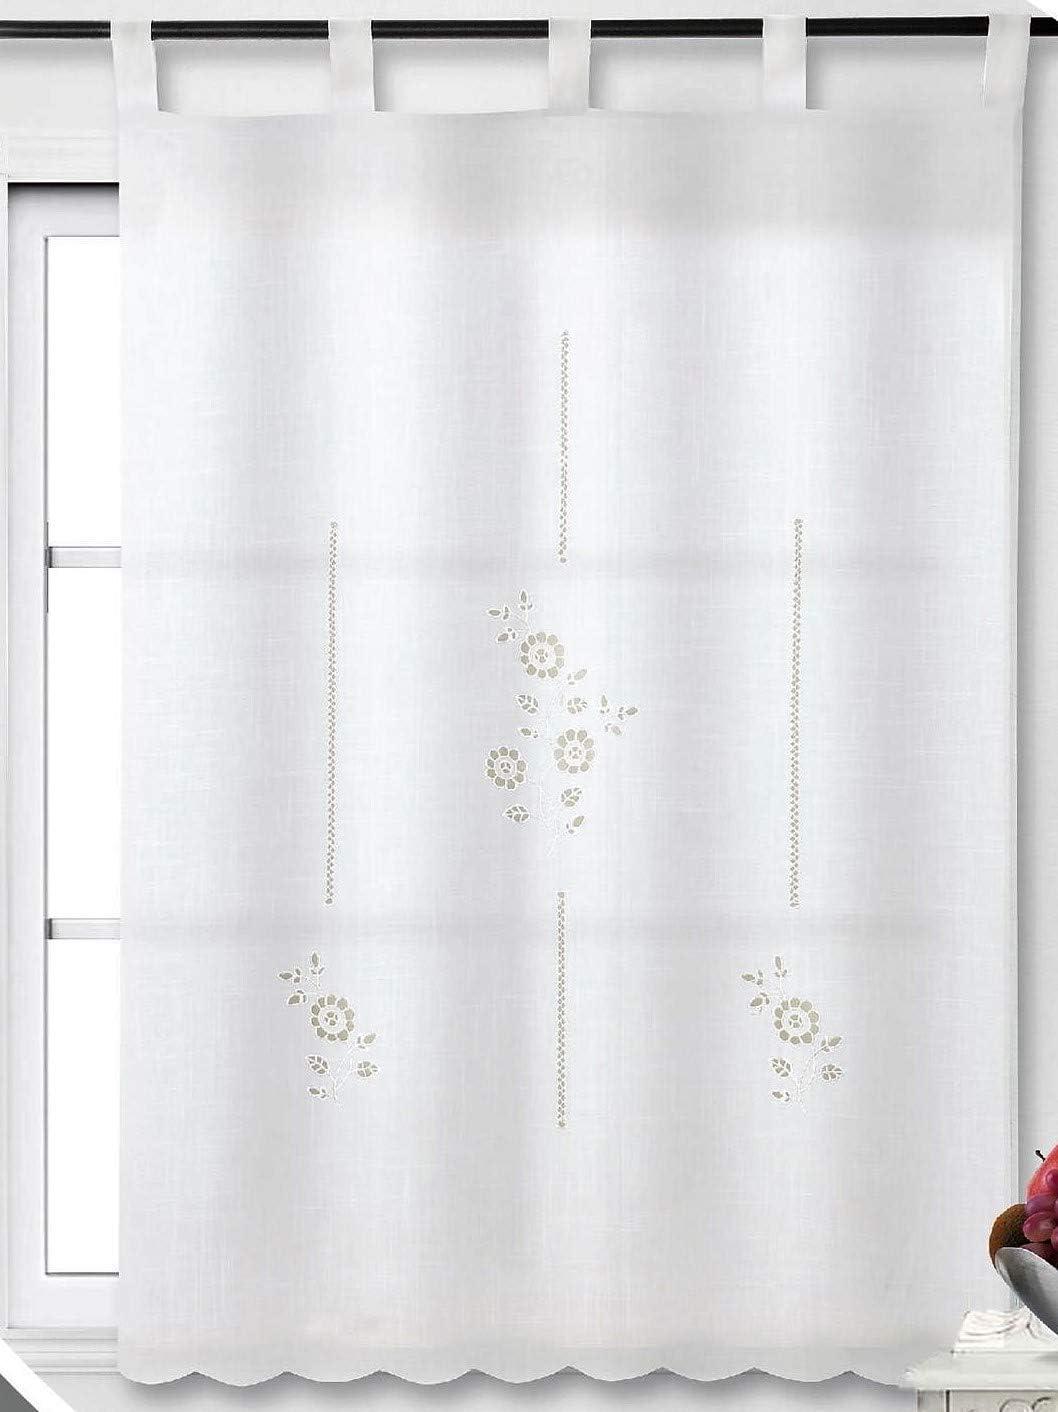 Forentex Pack 2 Cortinas Con Visillo 100X150Cm Para Para Cocina Bordadas Florales Decorativos Para Ventanas, S-1051,: Amazon.es: Hogar